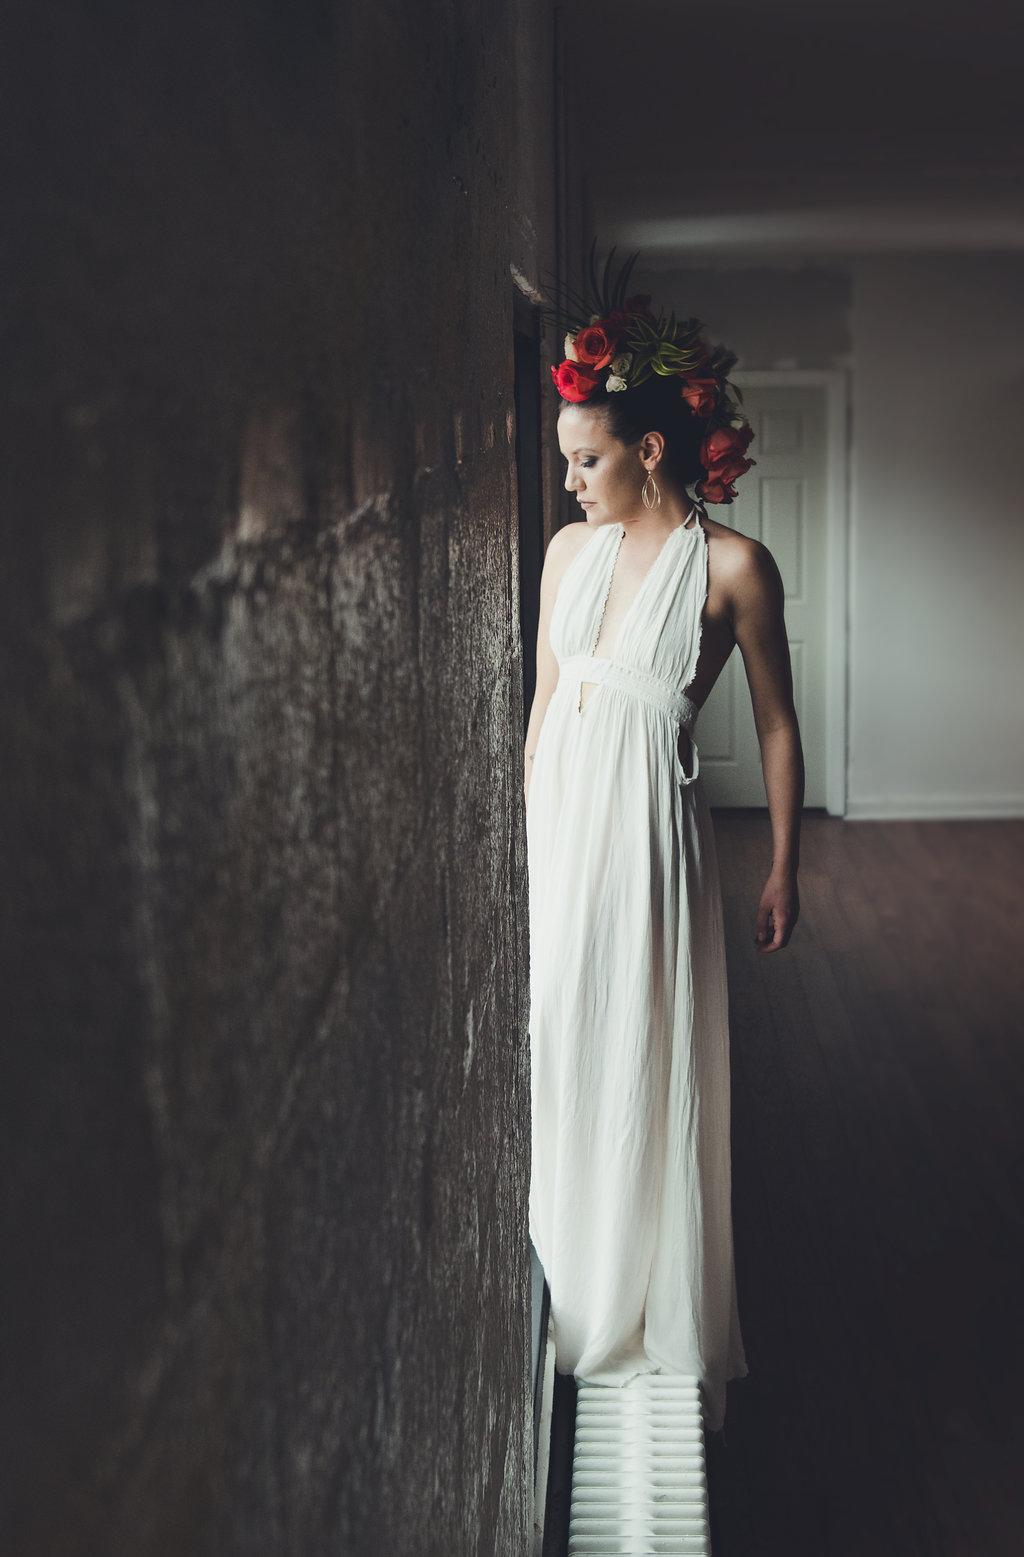 Lisa Rundall Wedding Photography Colorado model standing at window